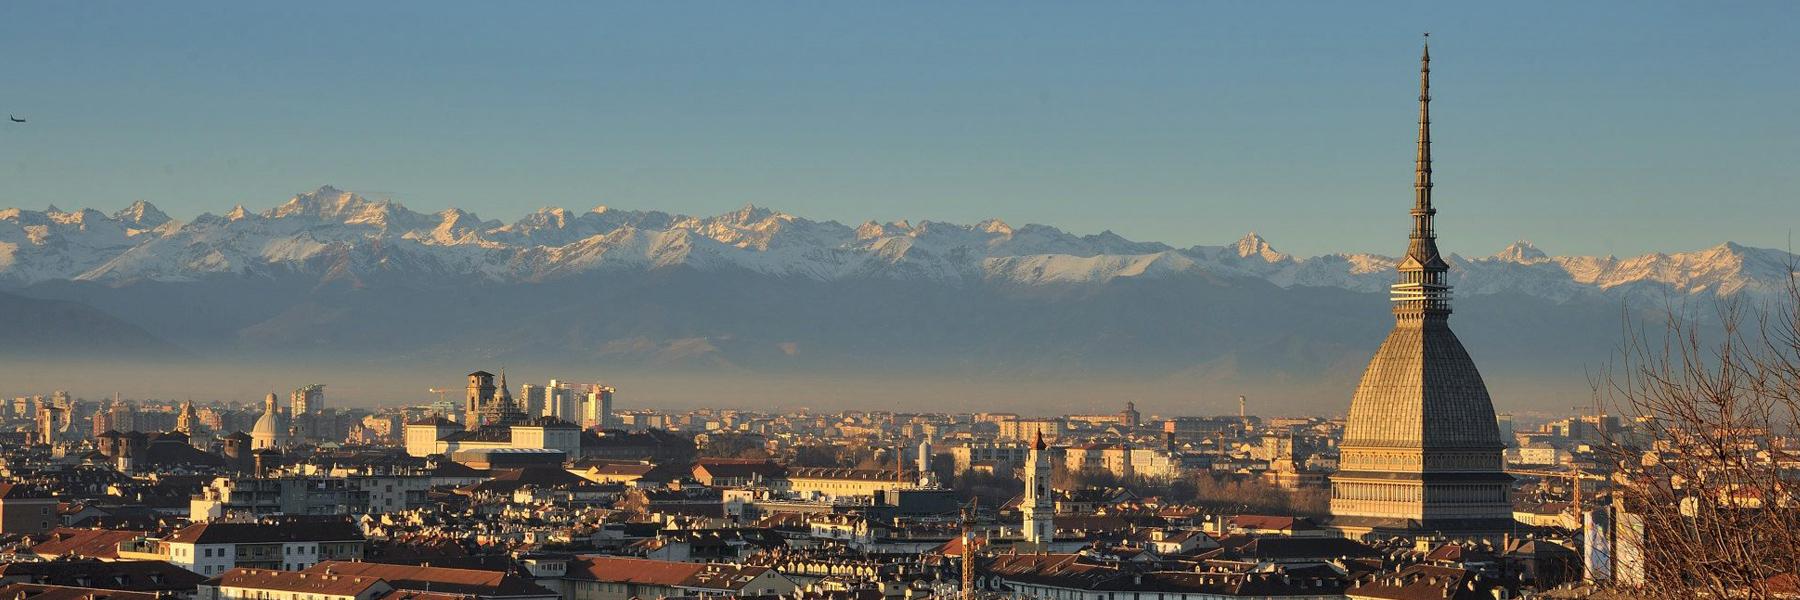 Torino Noleggio con Conducente noleggio con conducente